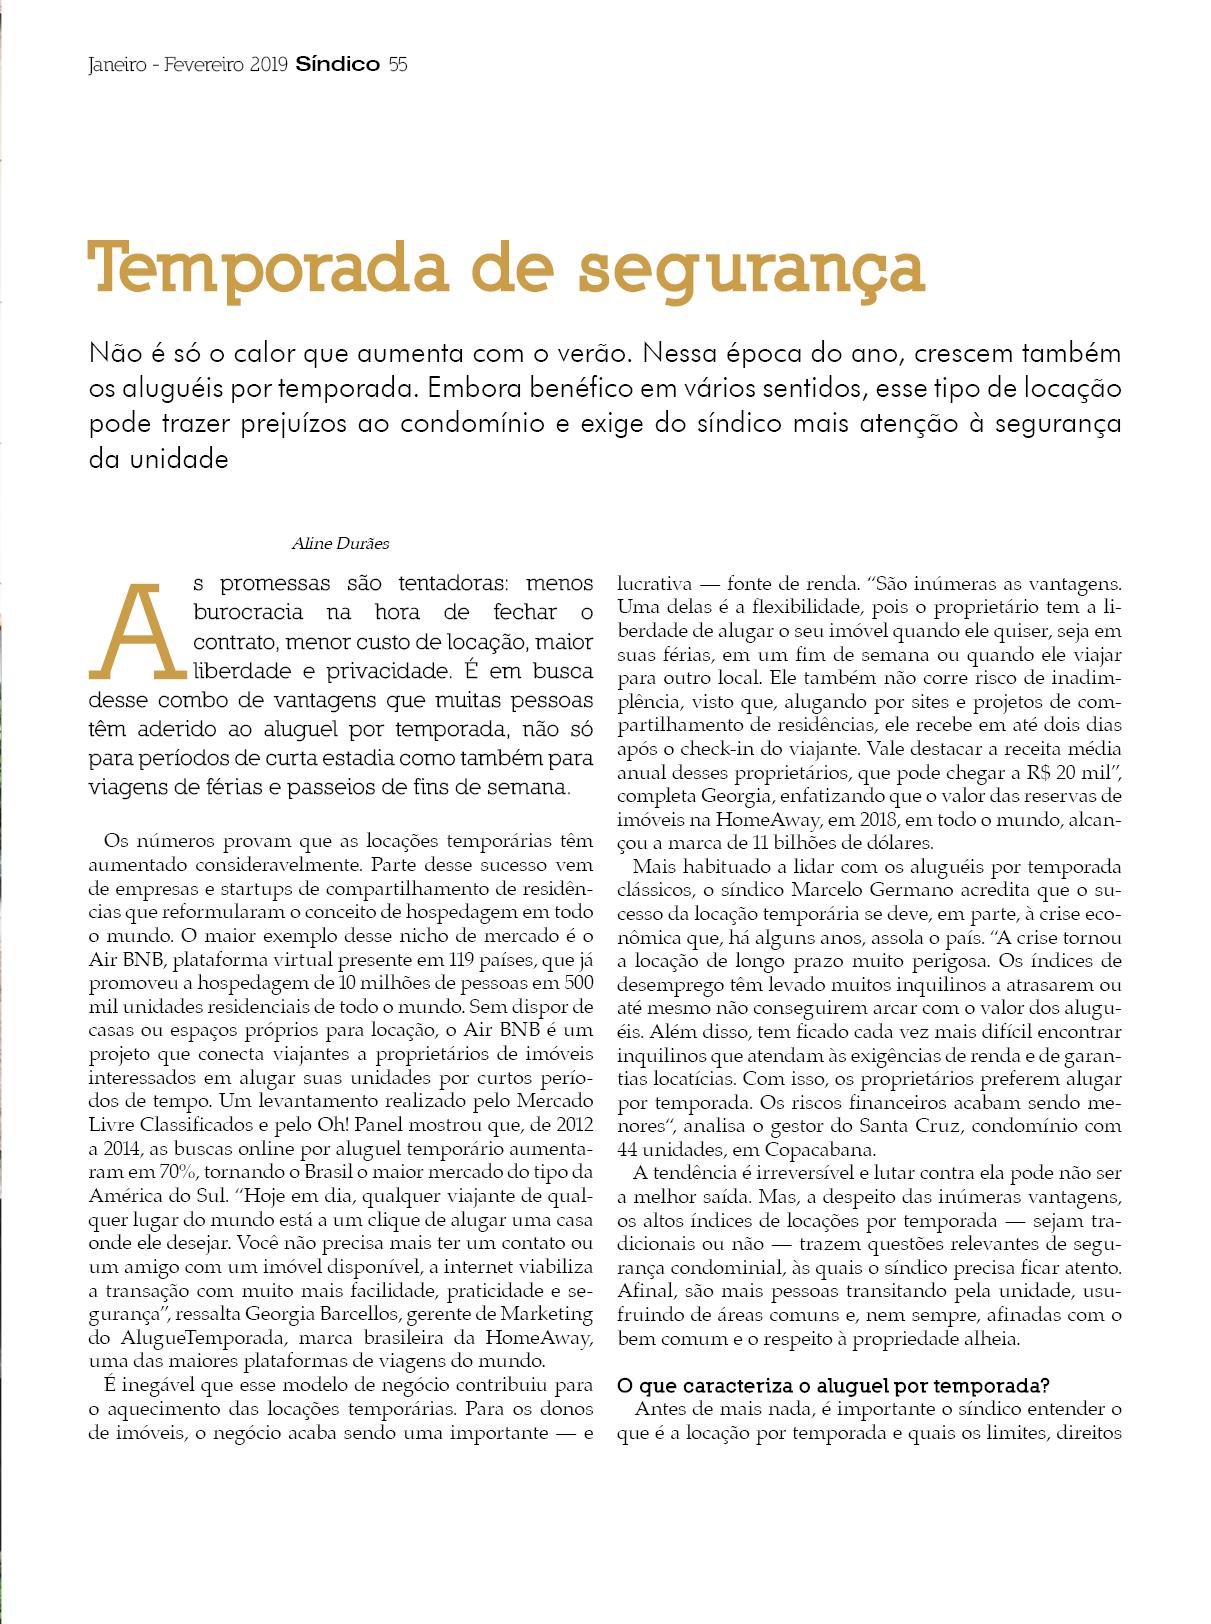 Revista Síndico_ed 242_53